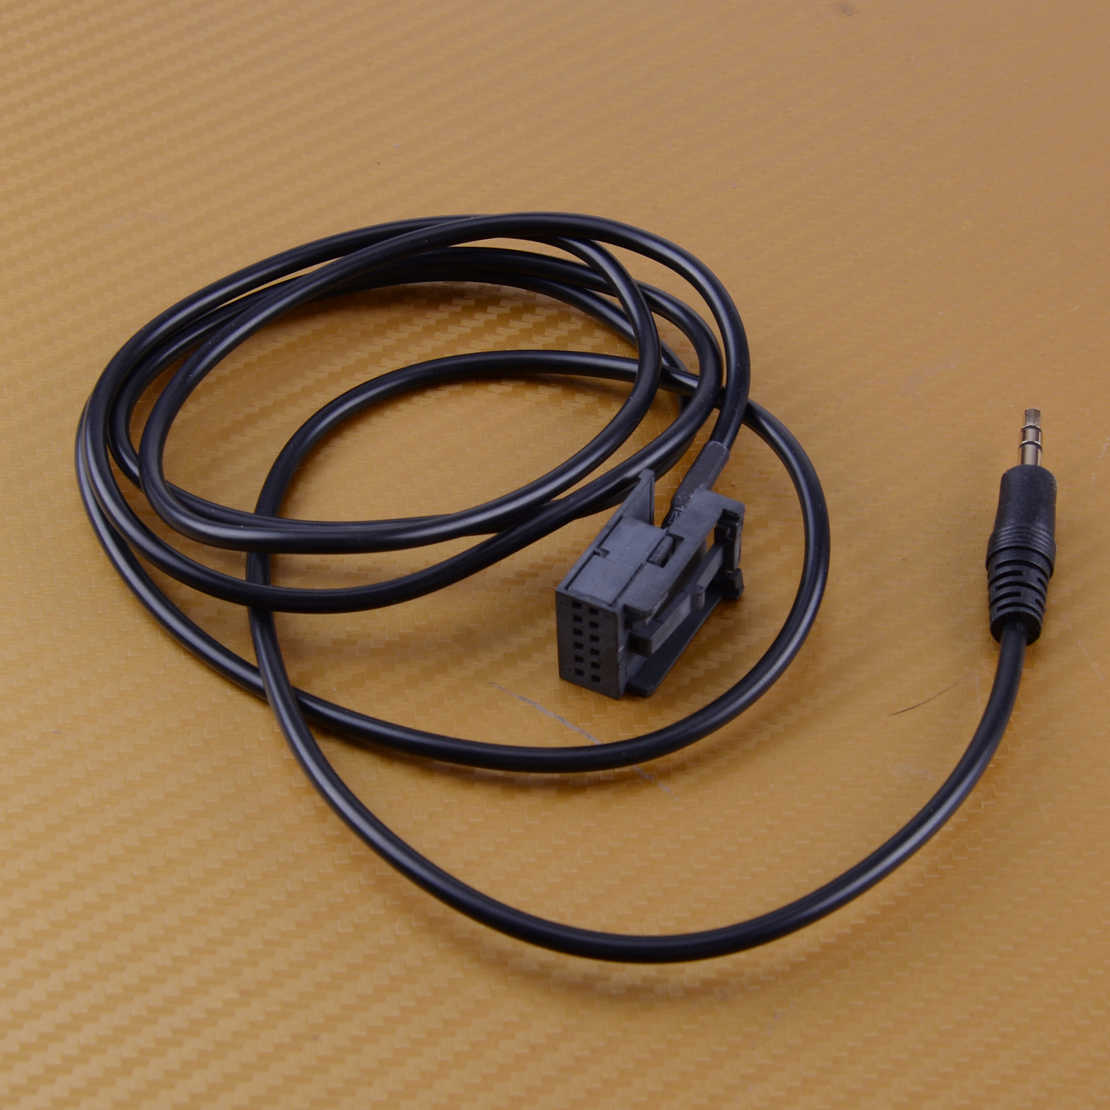 Vauxhall Cd30 Wiring